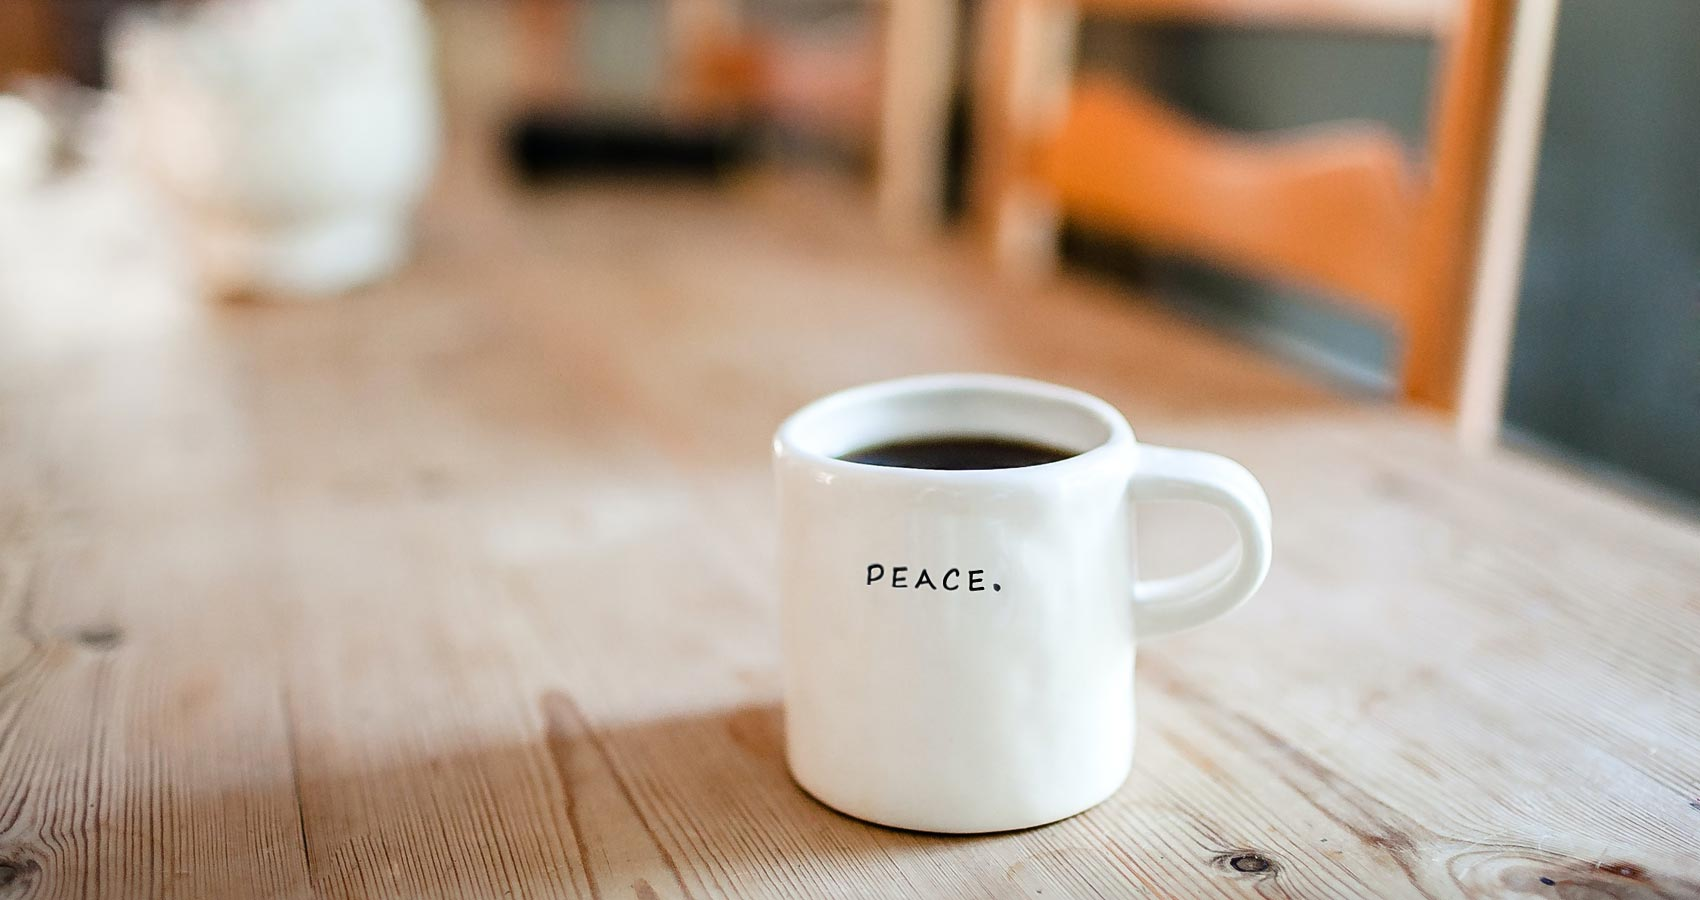 Coffee, poetry by David Gray-Hammondat Spillwords.com